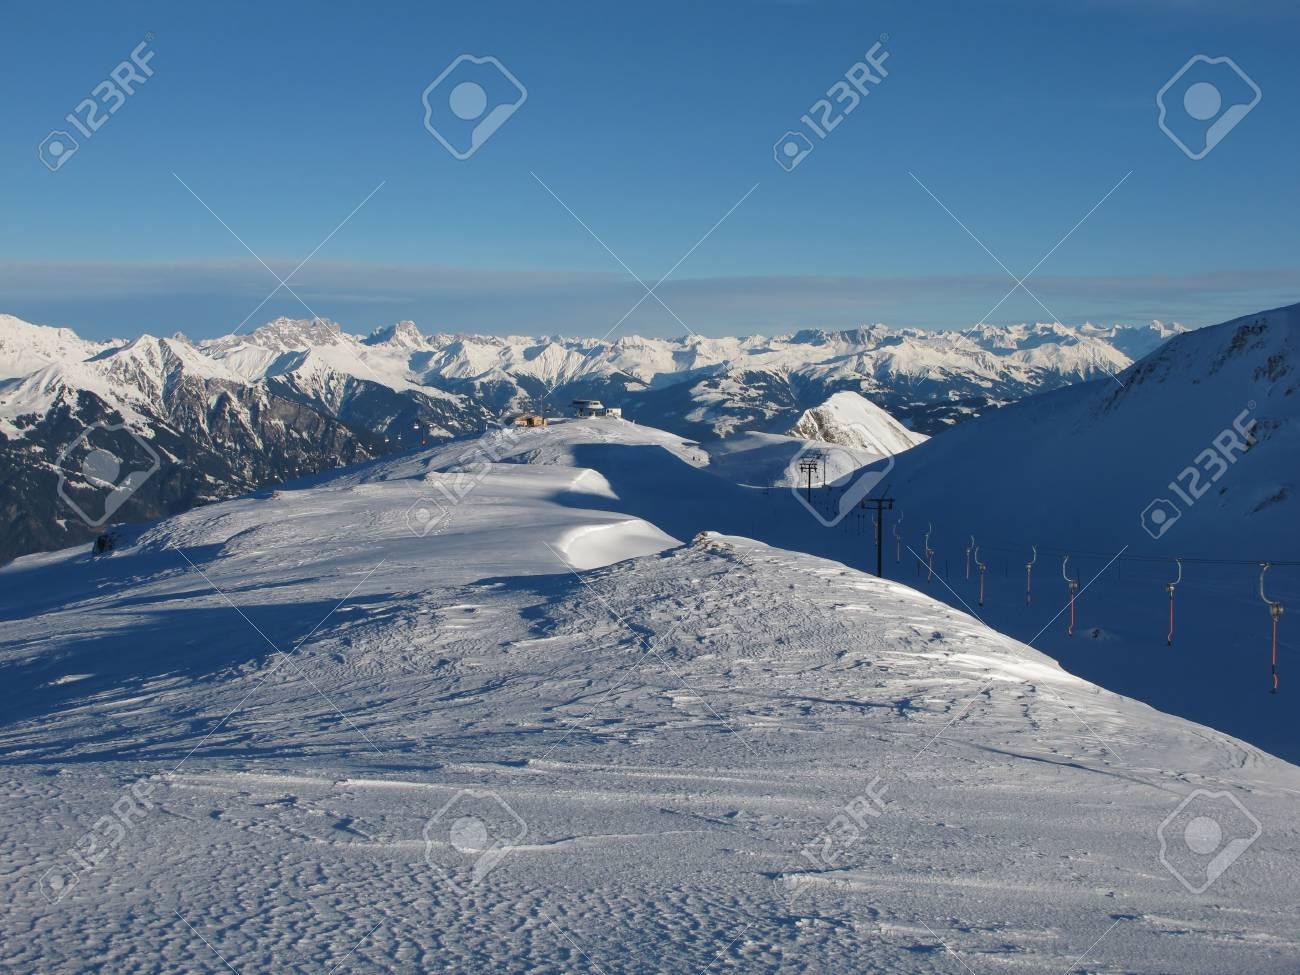 Ski Lift Of The Pizol Region, Beautiful Panorama Stock Photo - 17222345